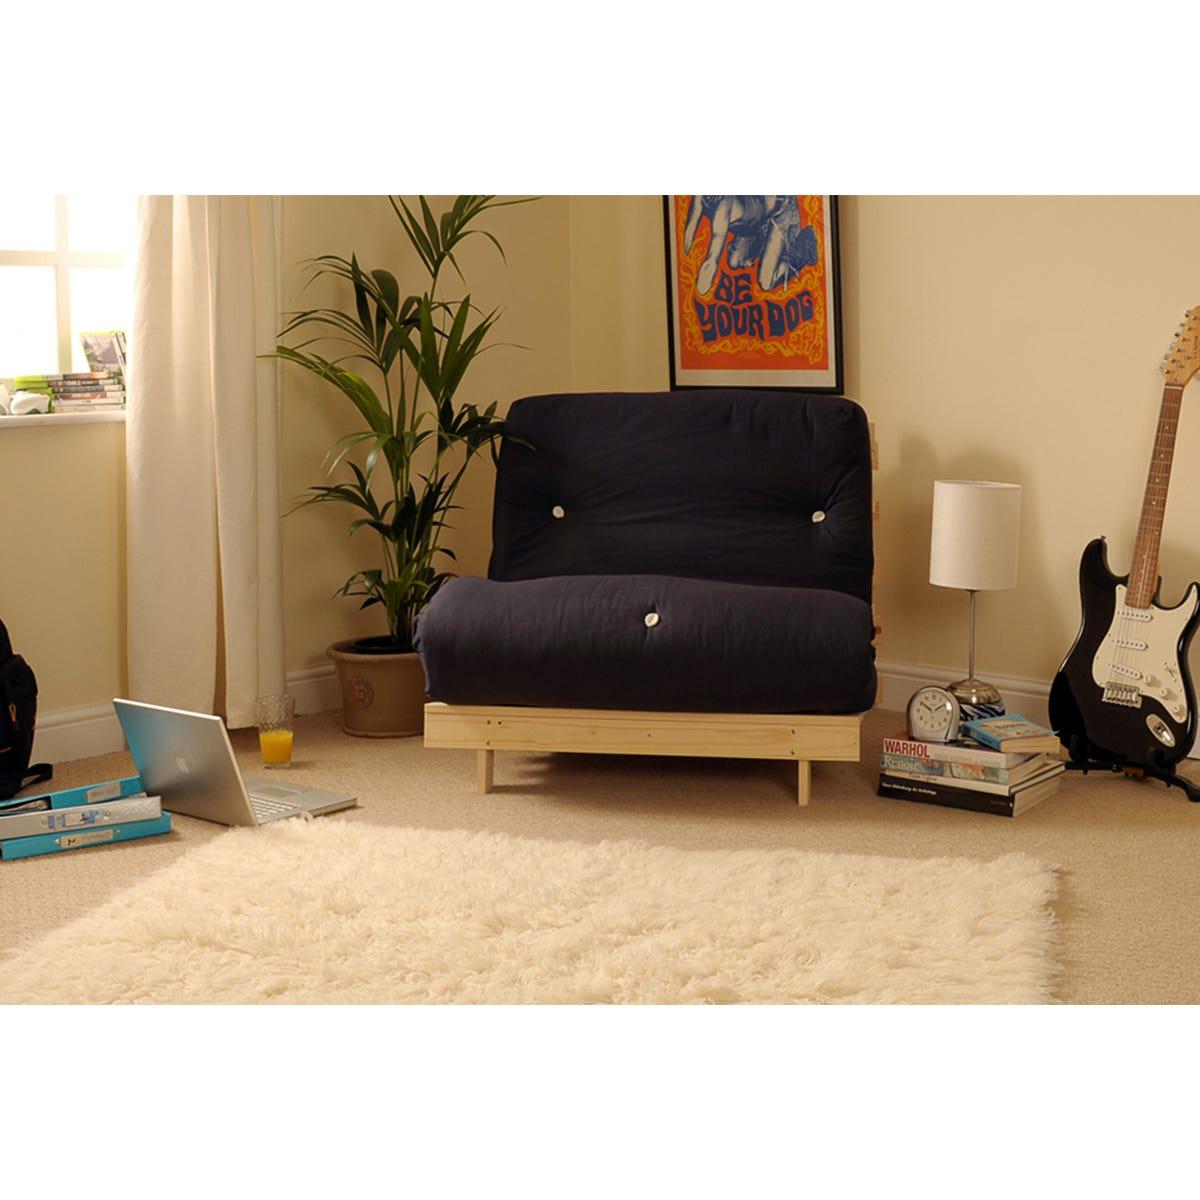 Albury Single Sofa Bed Set With Tufted Mattress - Black